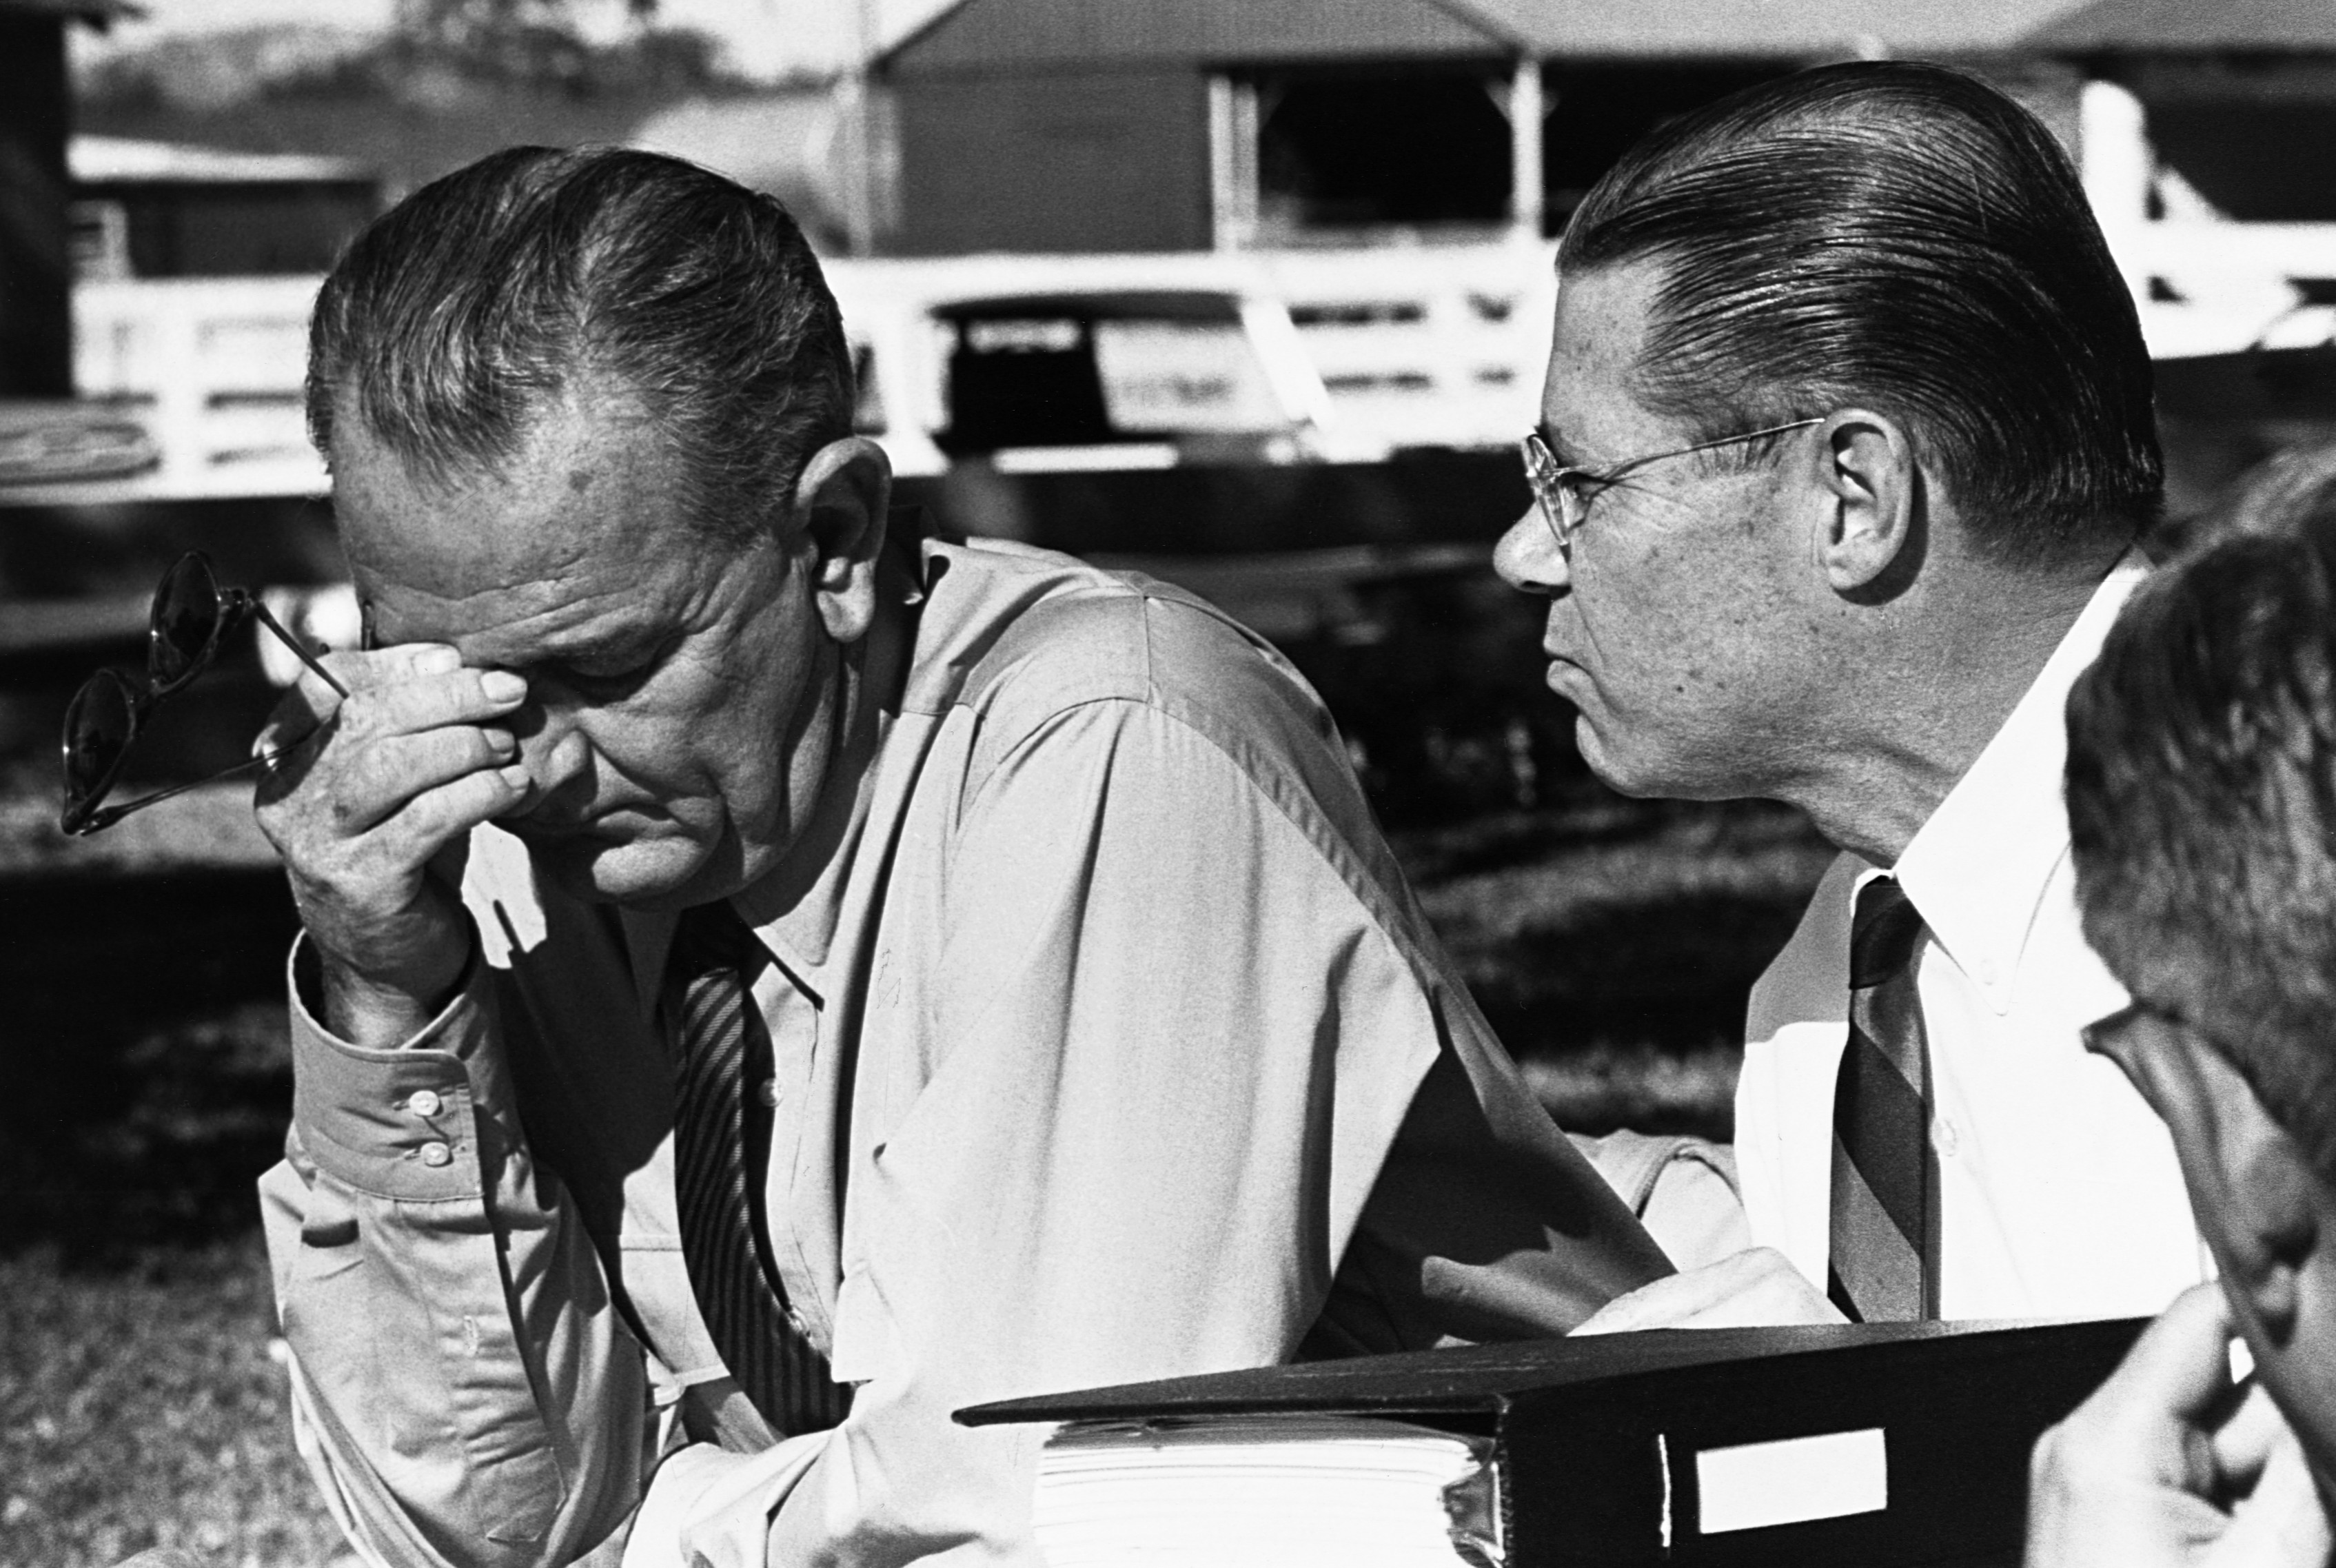 johnson vietnam war Lyndon baines johnson (/ˈlɪndən ˈbeɪnz ˈdʒɒnsən/ august 27, 1908 – january 22, 1973), often referred to as lbj, was the 36th president of the united states (1963–1969), a position he assumed after his service as the 37th vice president of the united states(1961–1963.